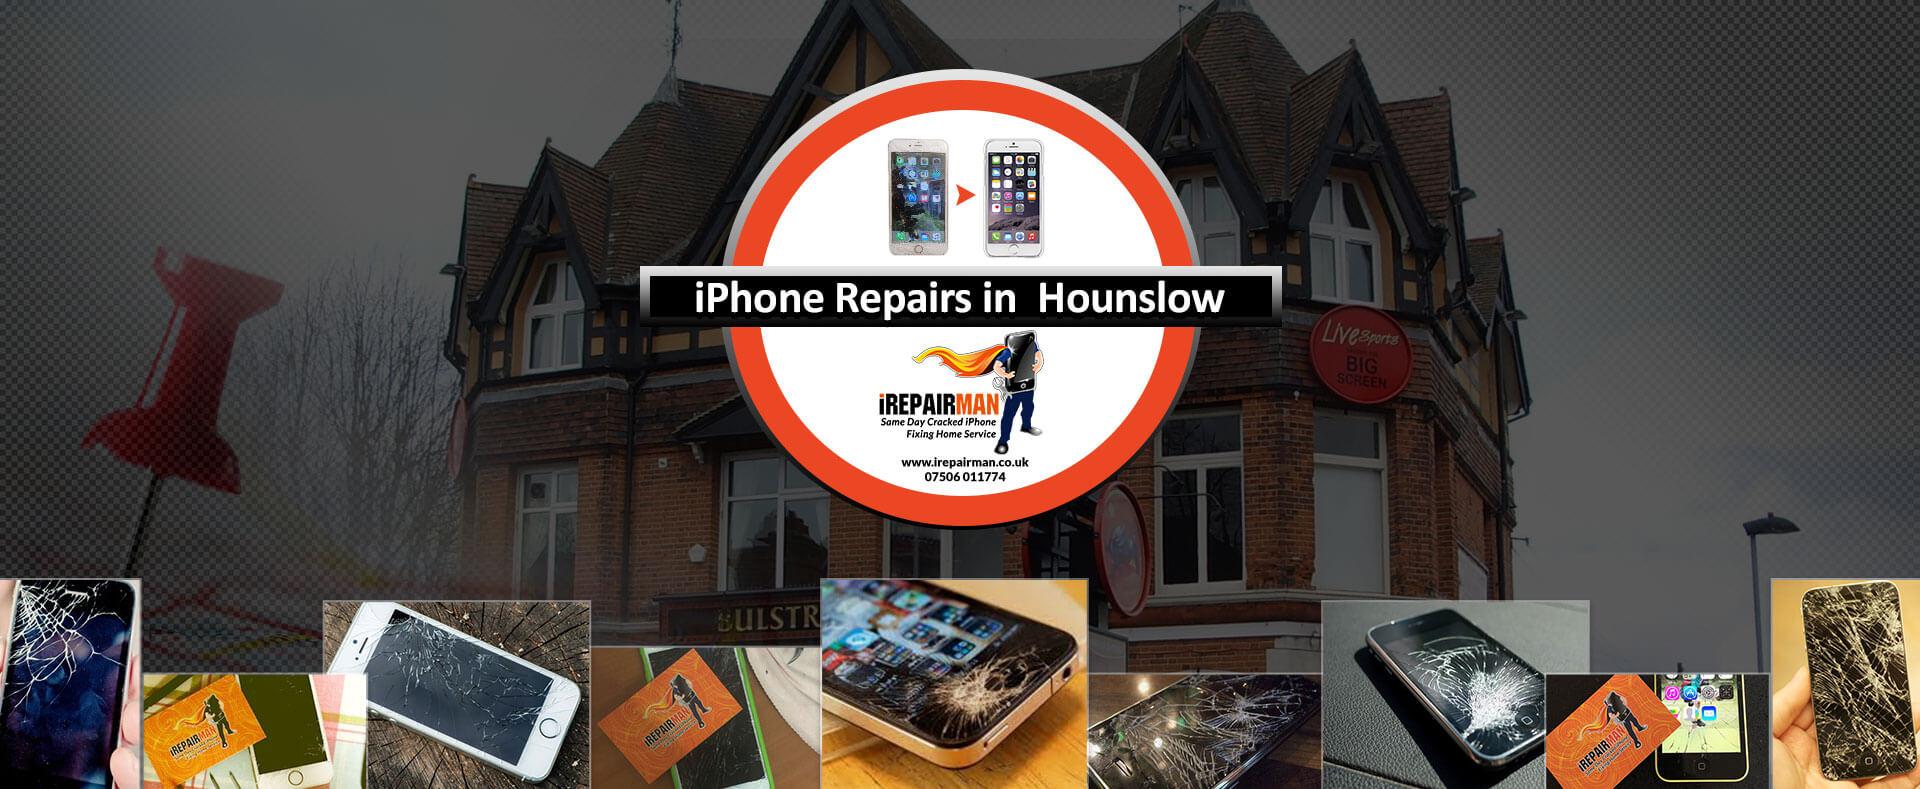 iPhone Repairs in Hounslow